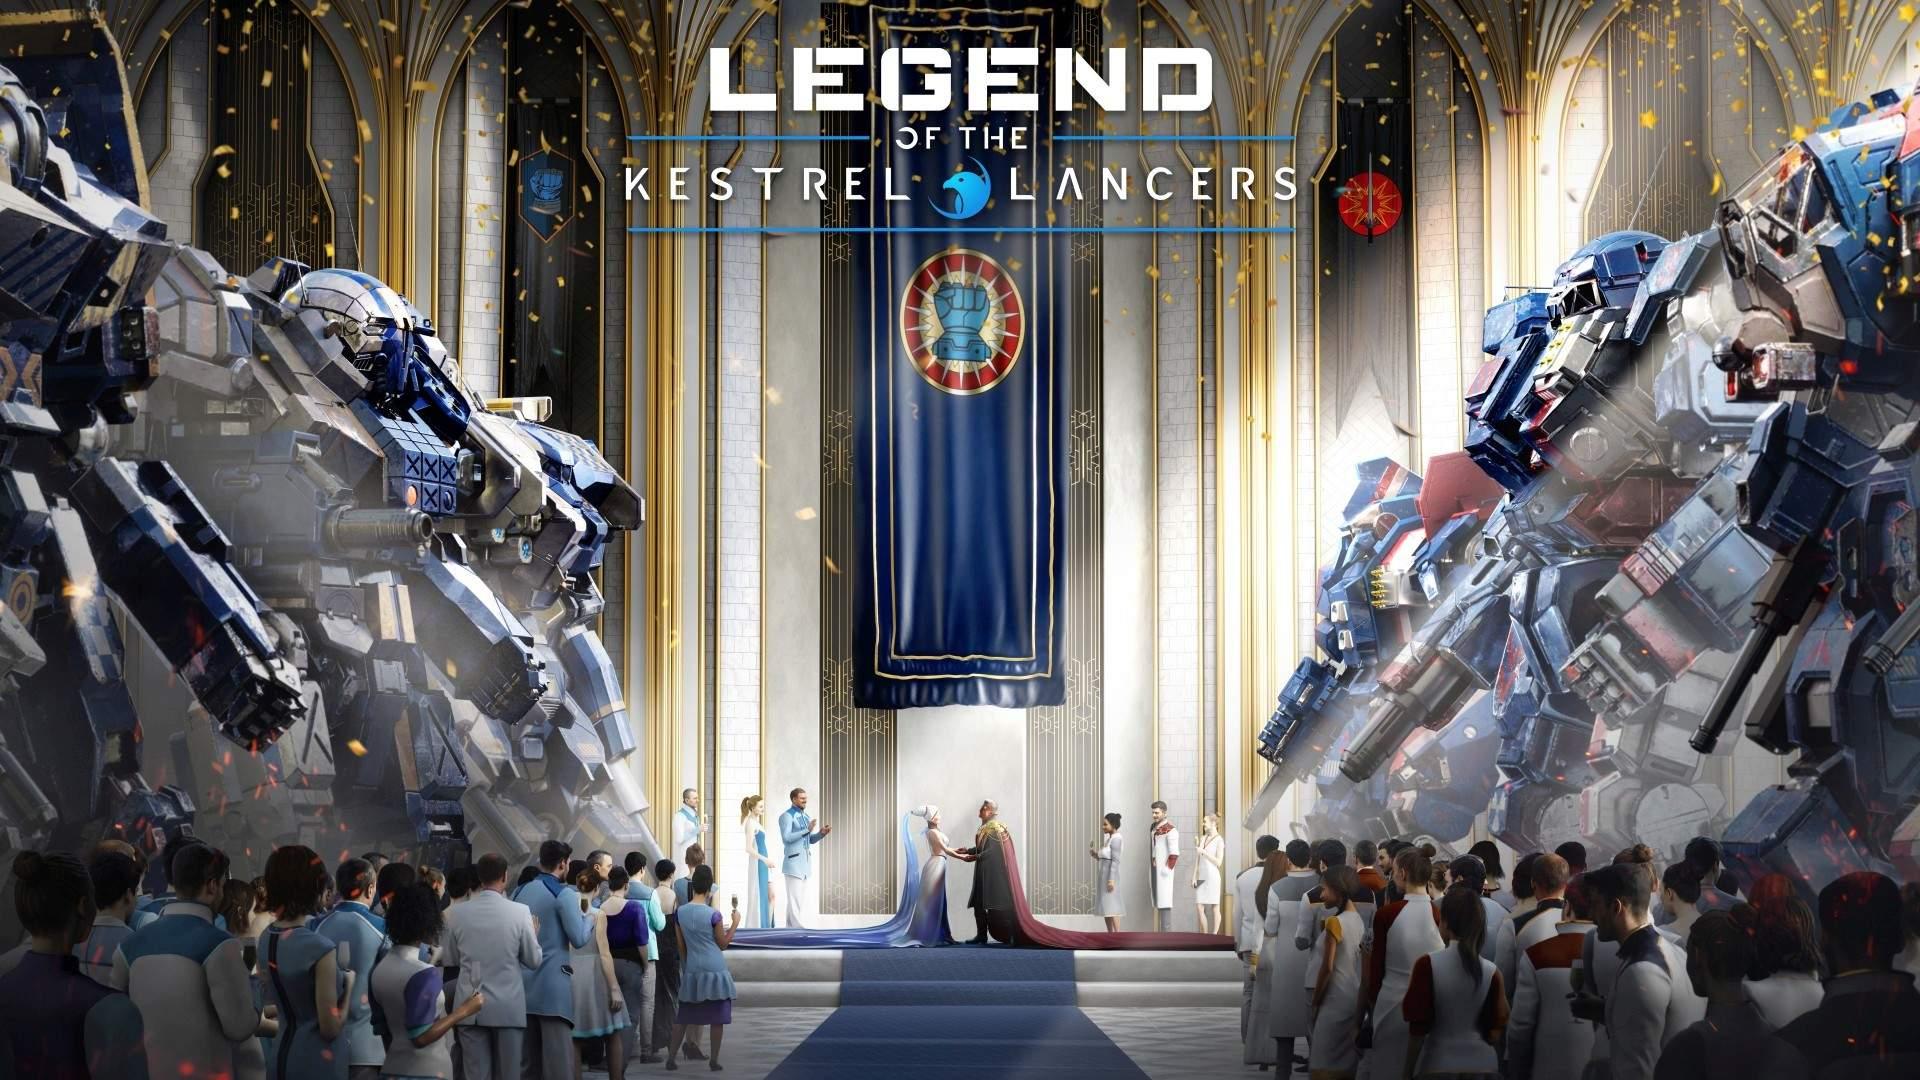 L'espansione Legend of the Kestrel Lancers in arrivo su MechWarrior 5: Mercenaries il 23 settembre